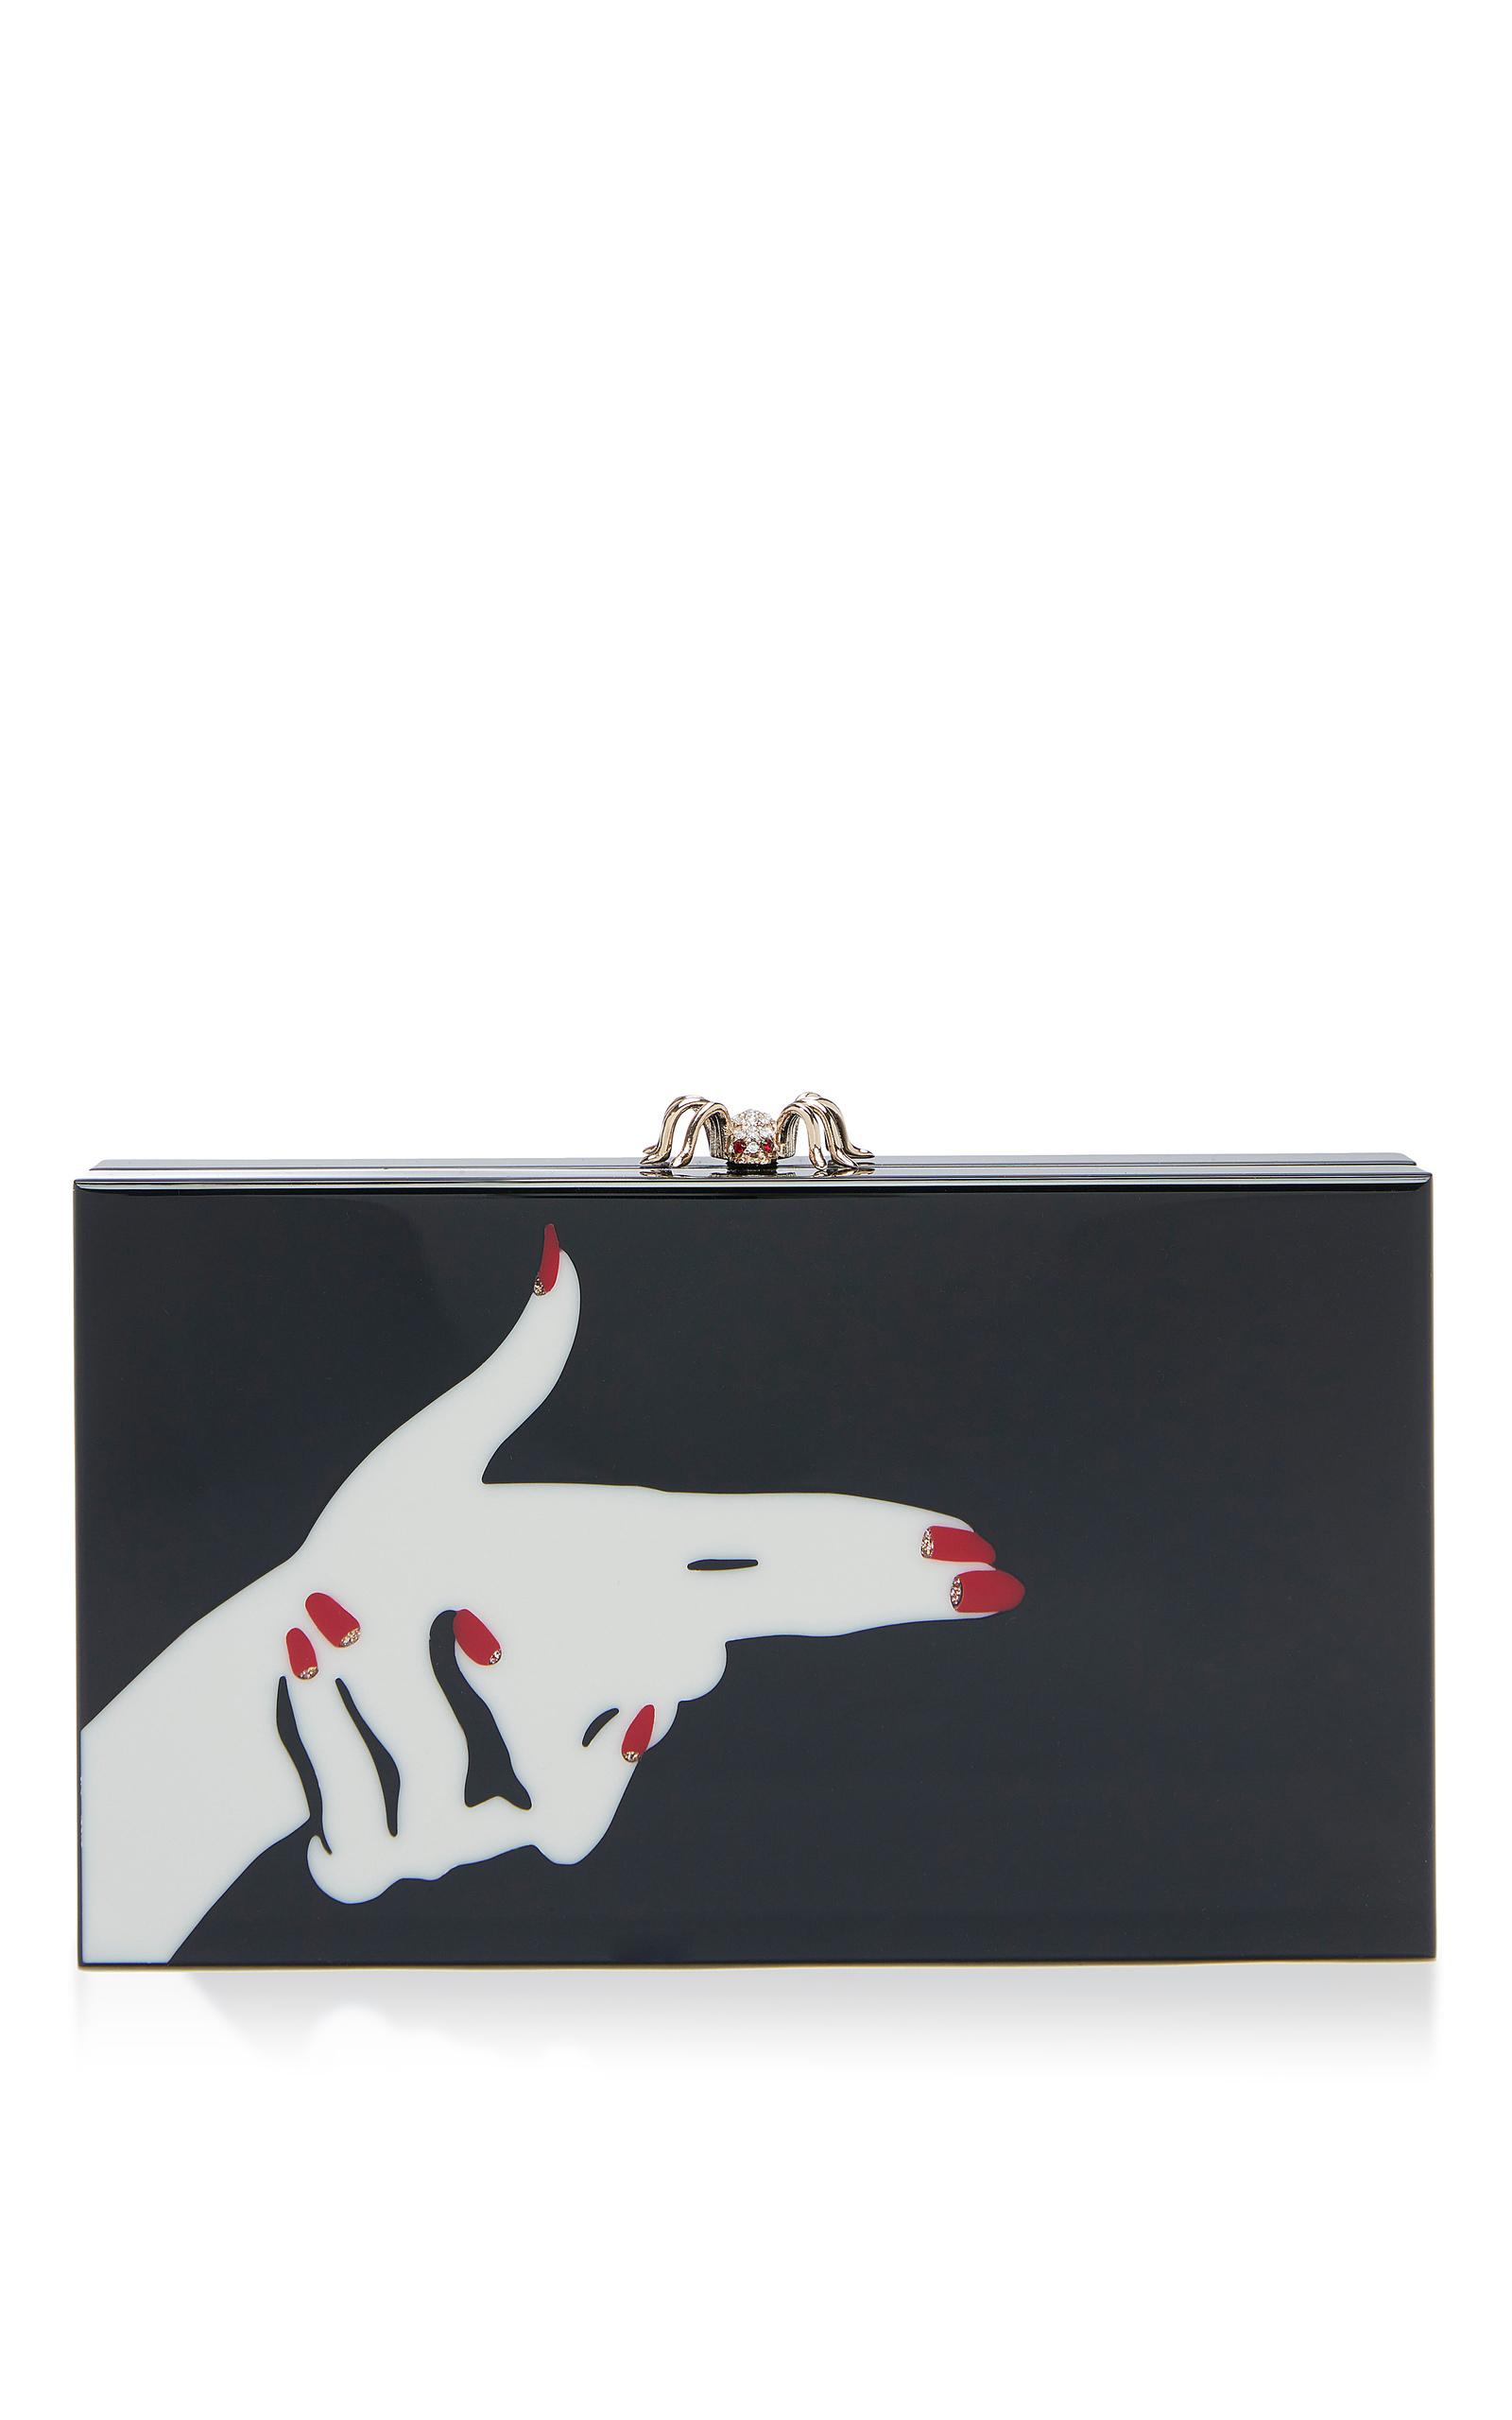 Charlotte Olympia Black Killer Pandora Box Clutch